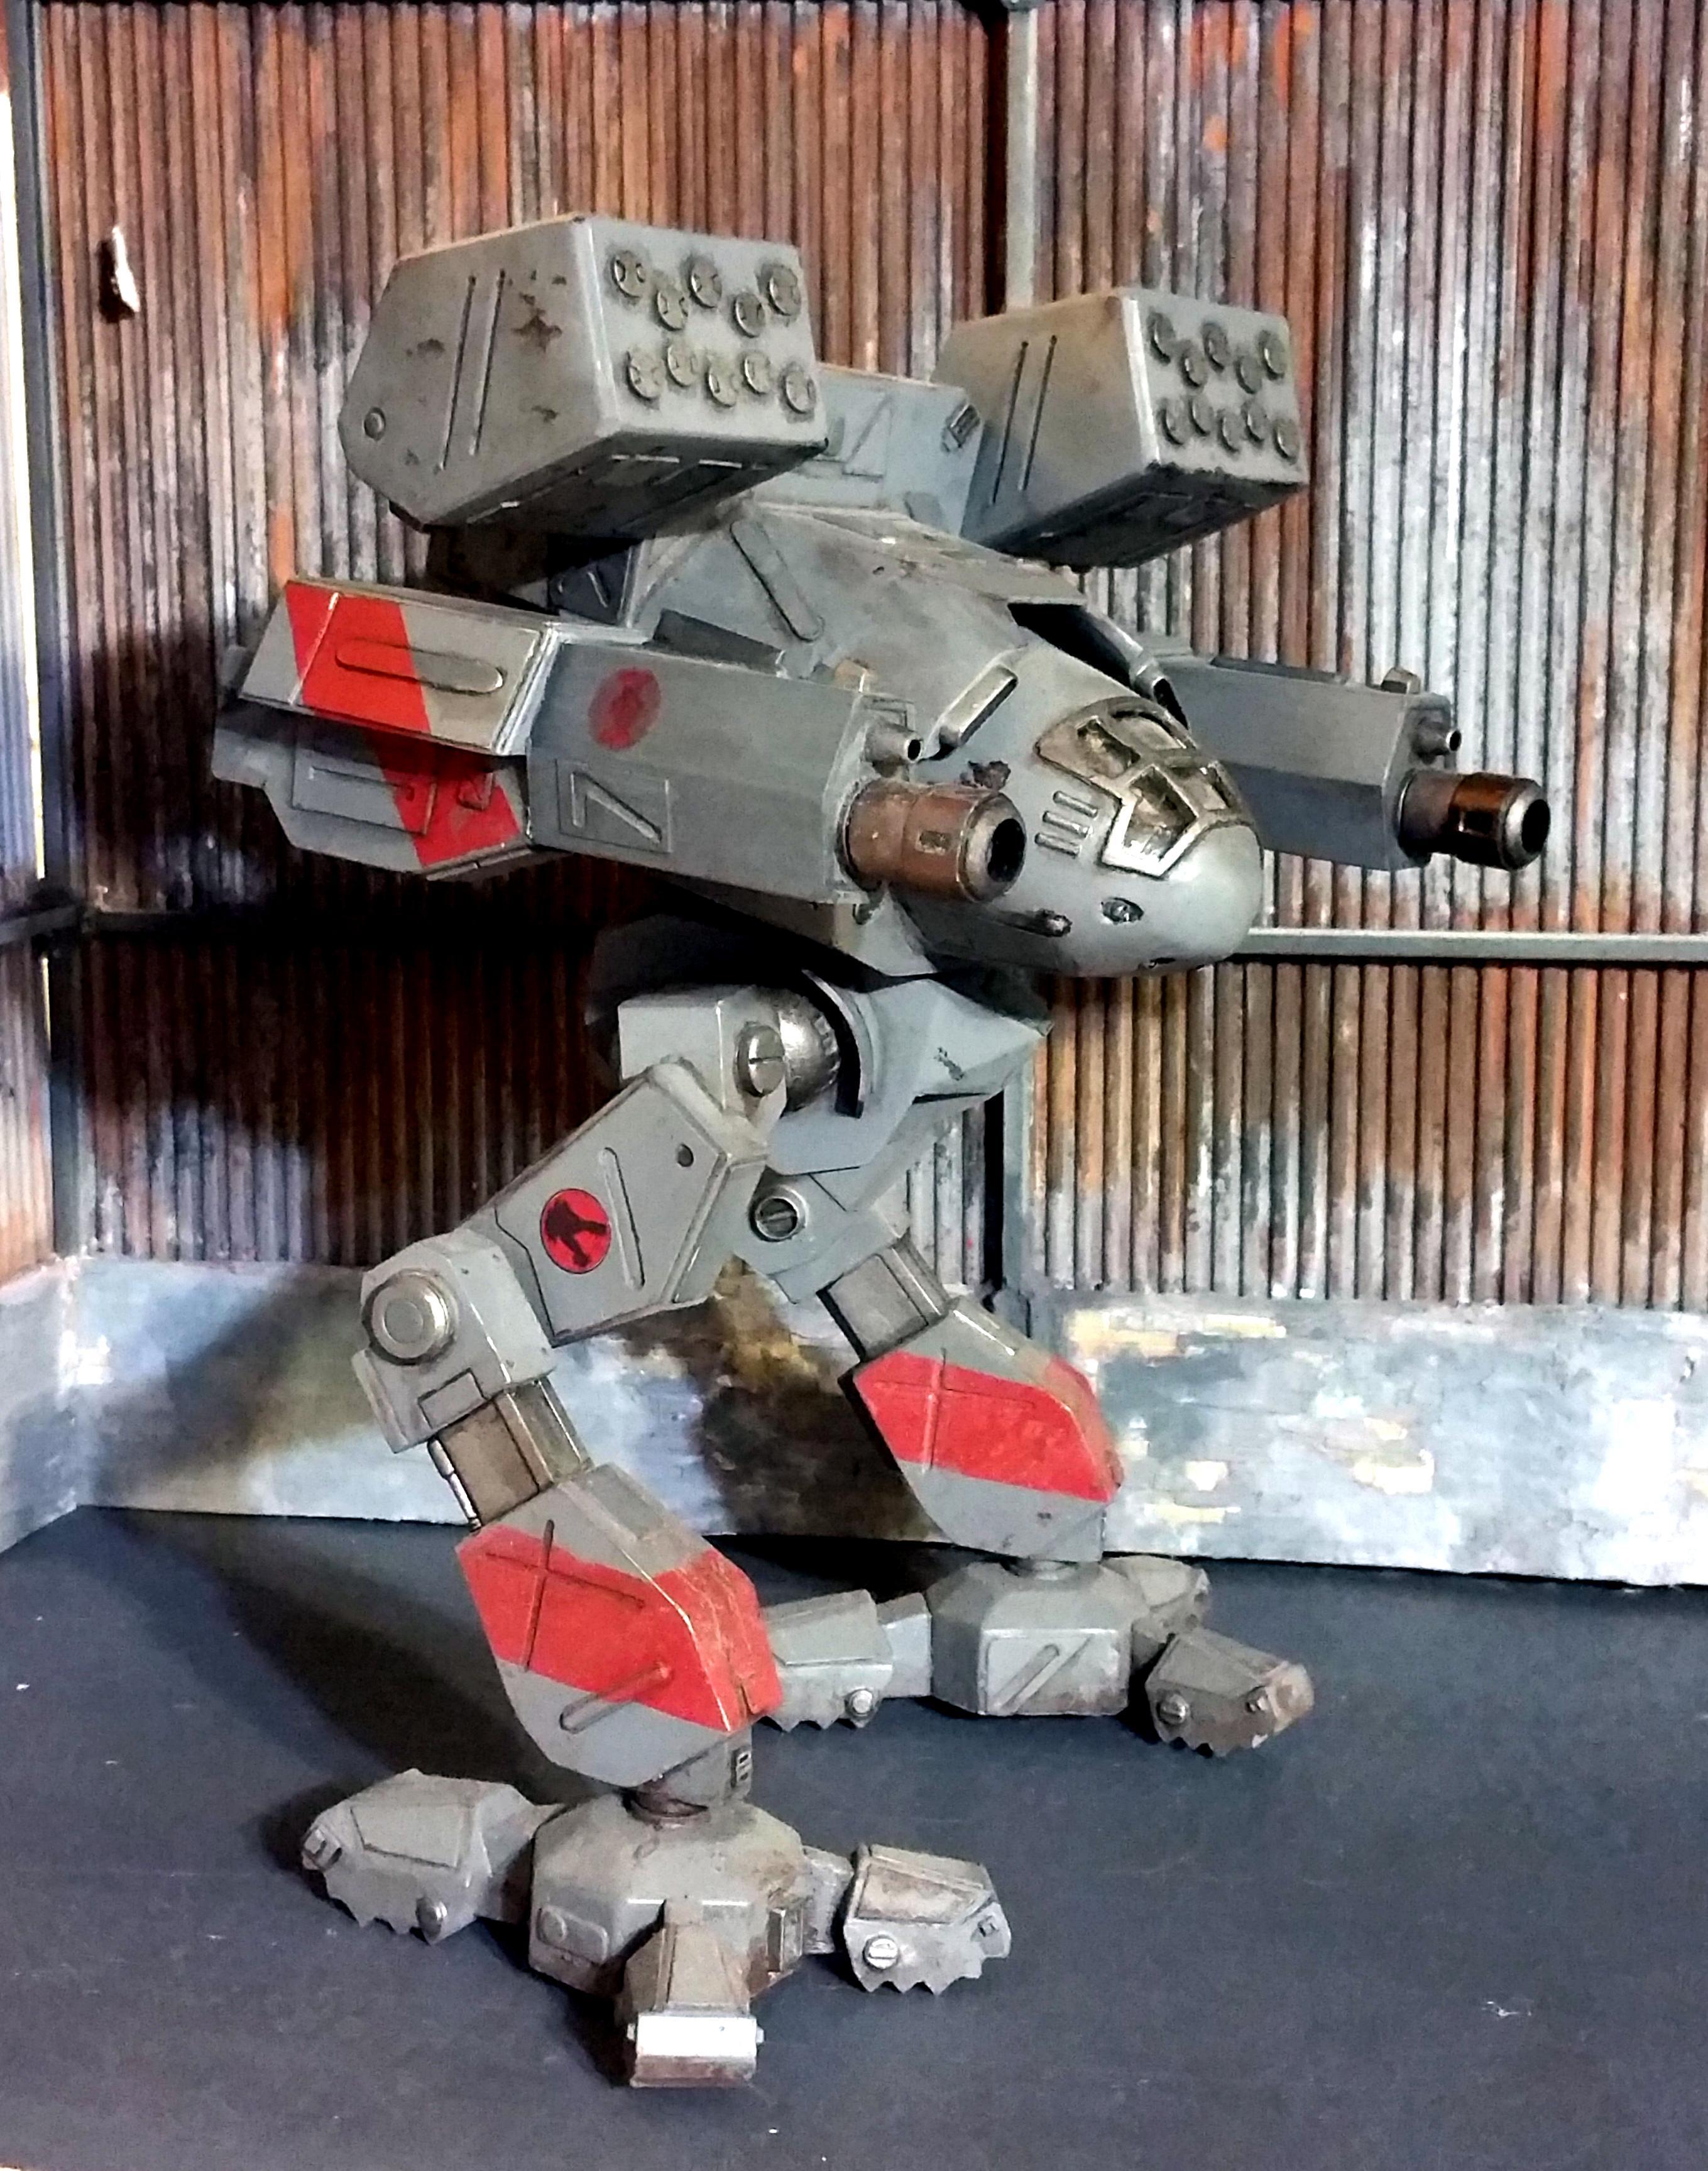 1:60 Battletech, Battlemech, Battletech Battlemech 1/60 Mechwarrior, Mechwarror